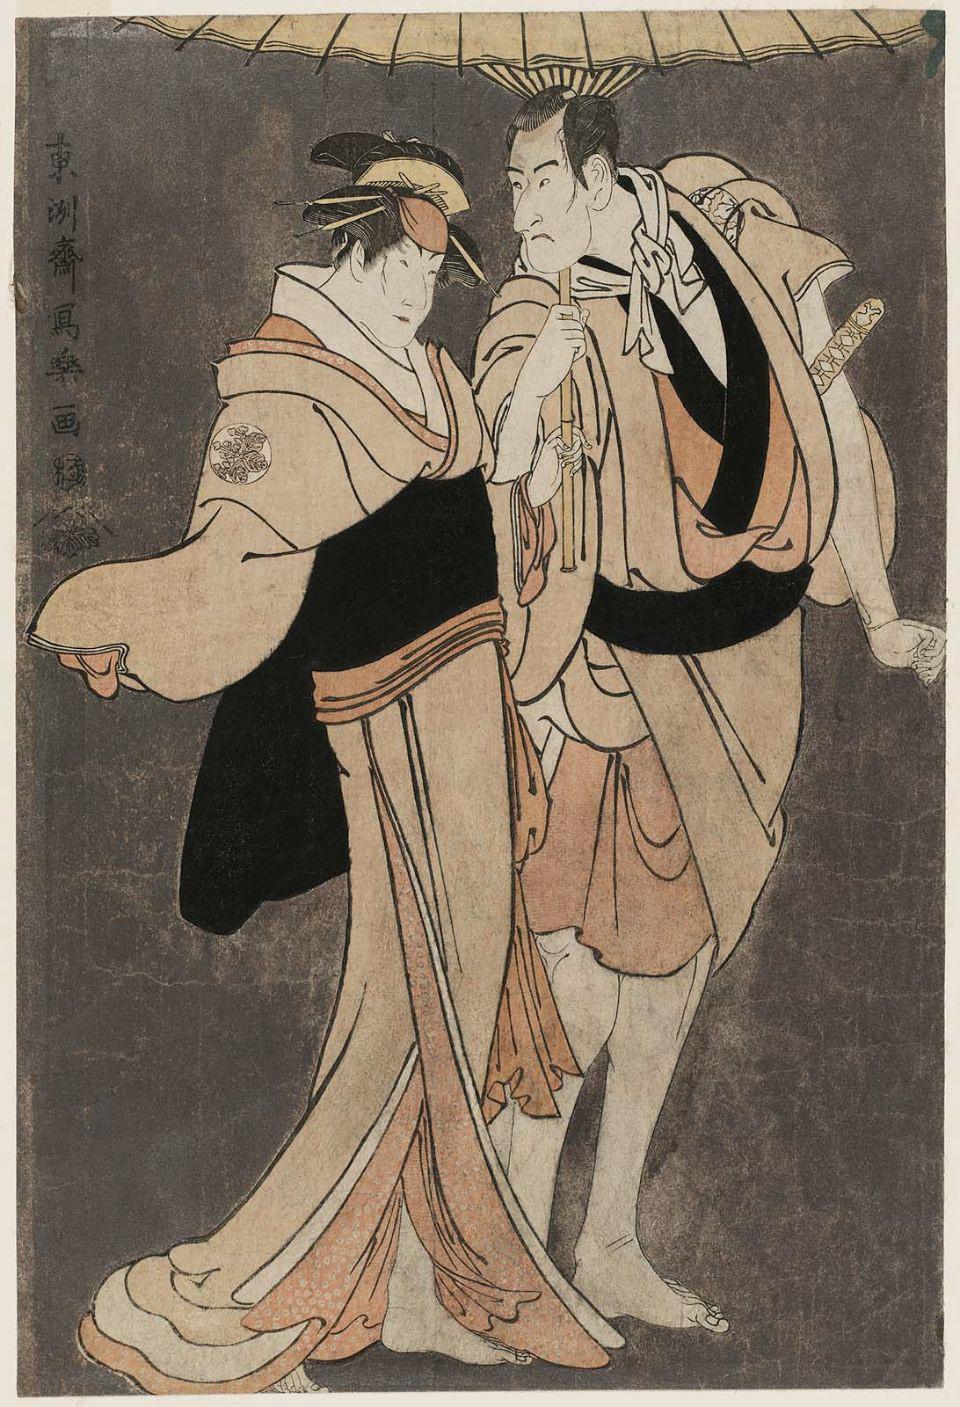 T?sh?sai Sharaku (1794) Ichikawa Komazo III as Kameya Chubei and Nakayama Tomisaburo as Umegawa.jpg